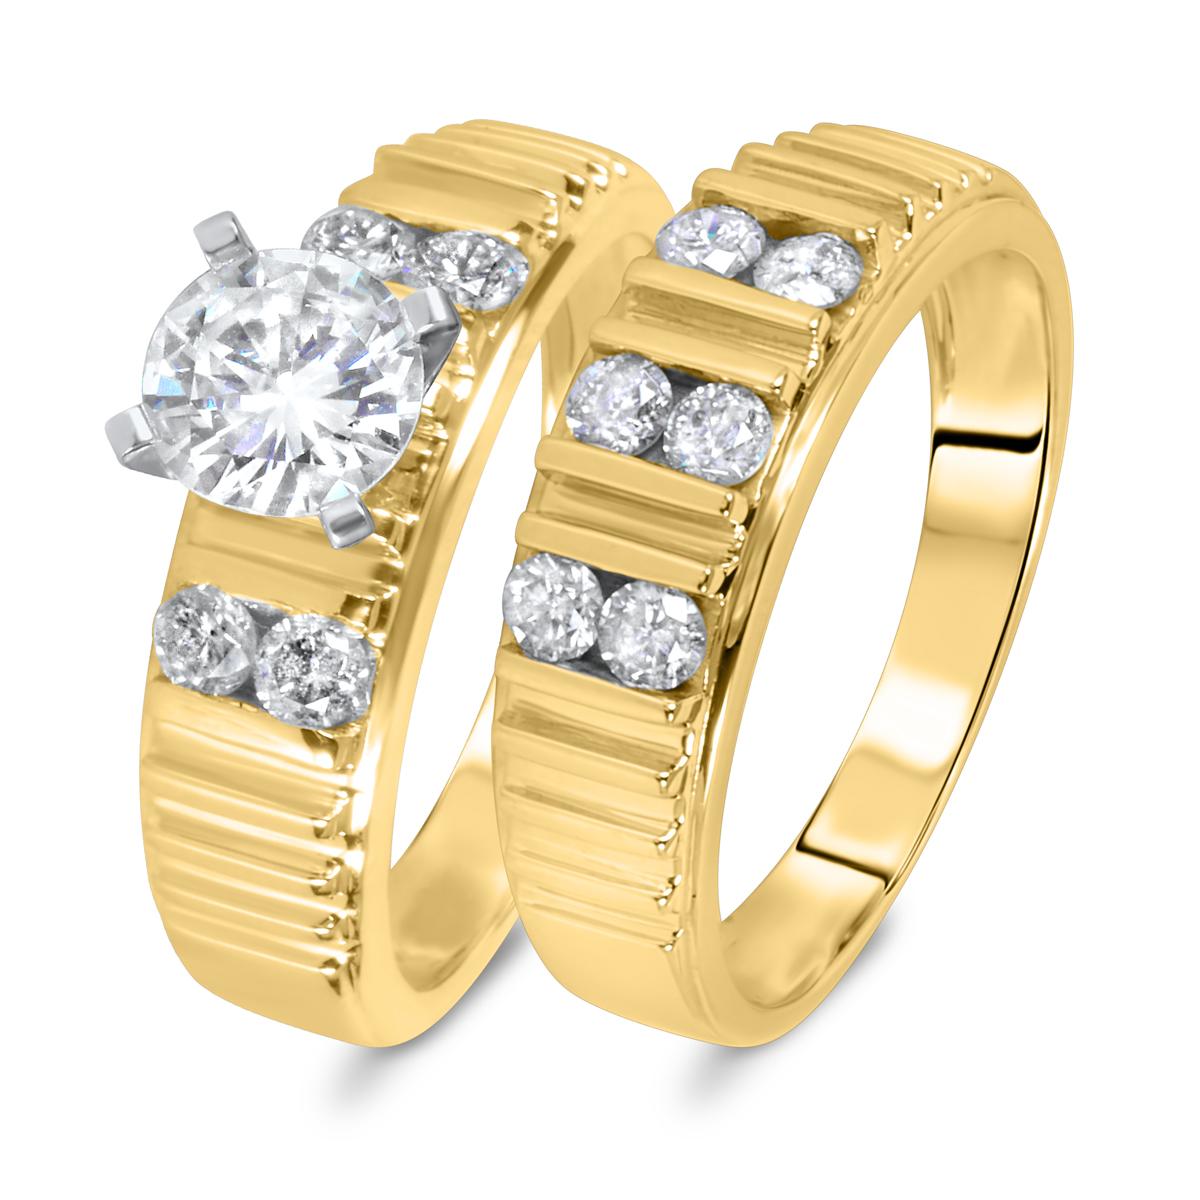 1 3/8 CT. T.W. Diamond Women's Bridal Wedding Ring Set 14K Yellow Gold